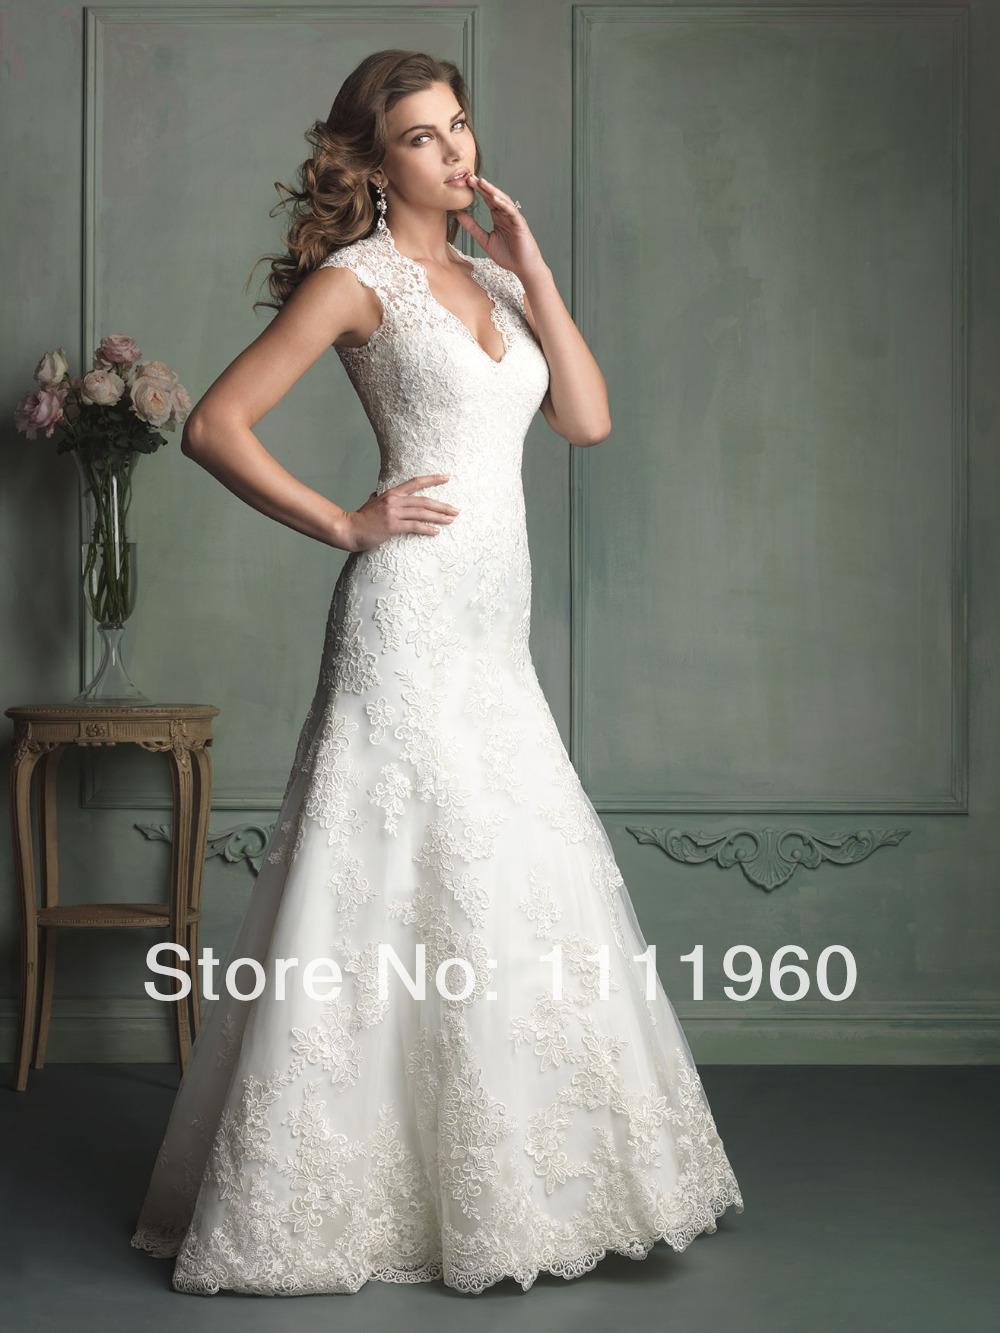 buy a new or used wedding dress used wedding dresses Buy a New or Used Wedding Dress